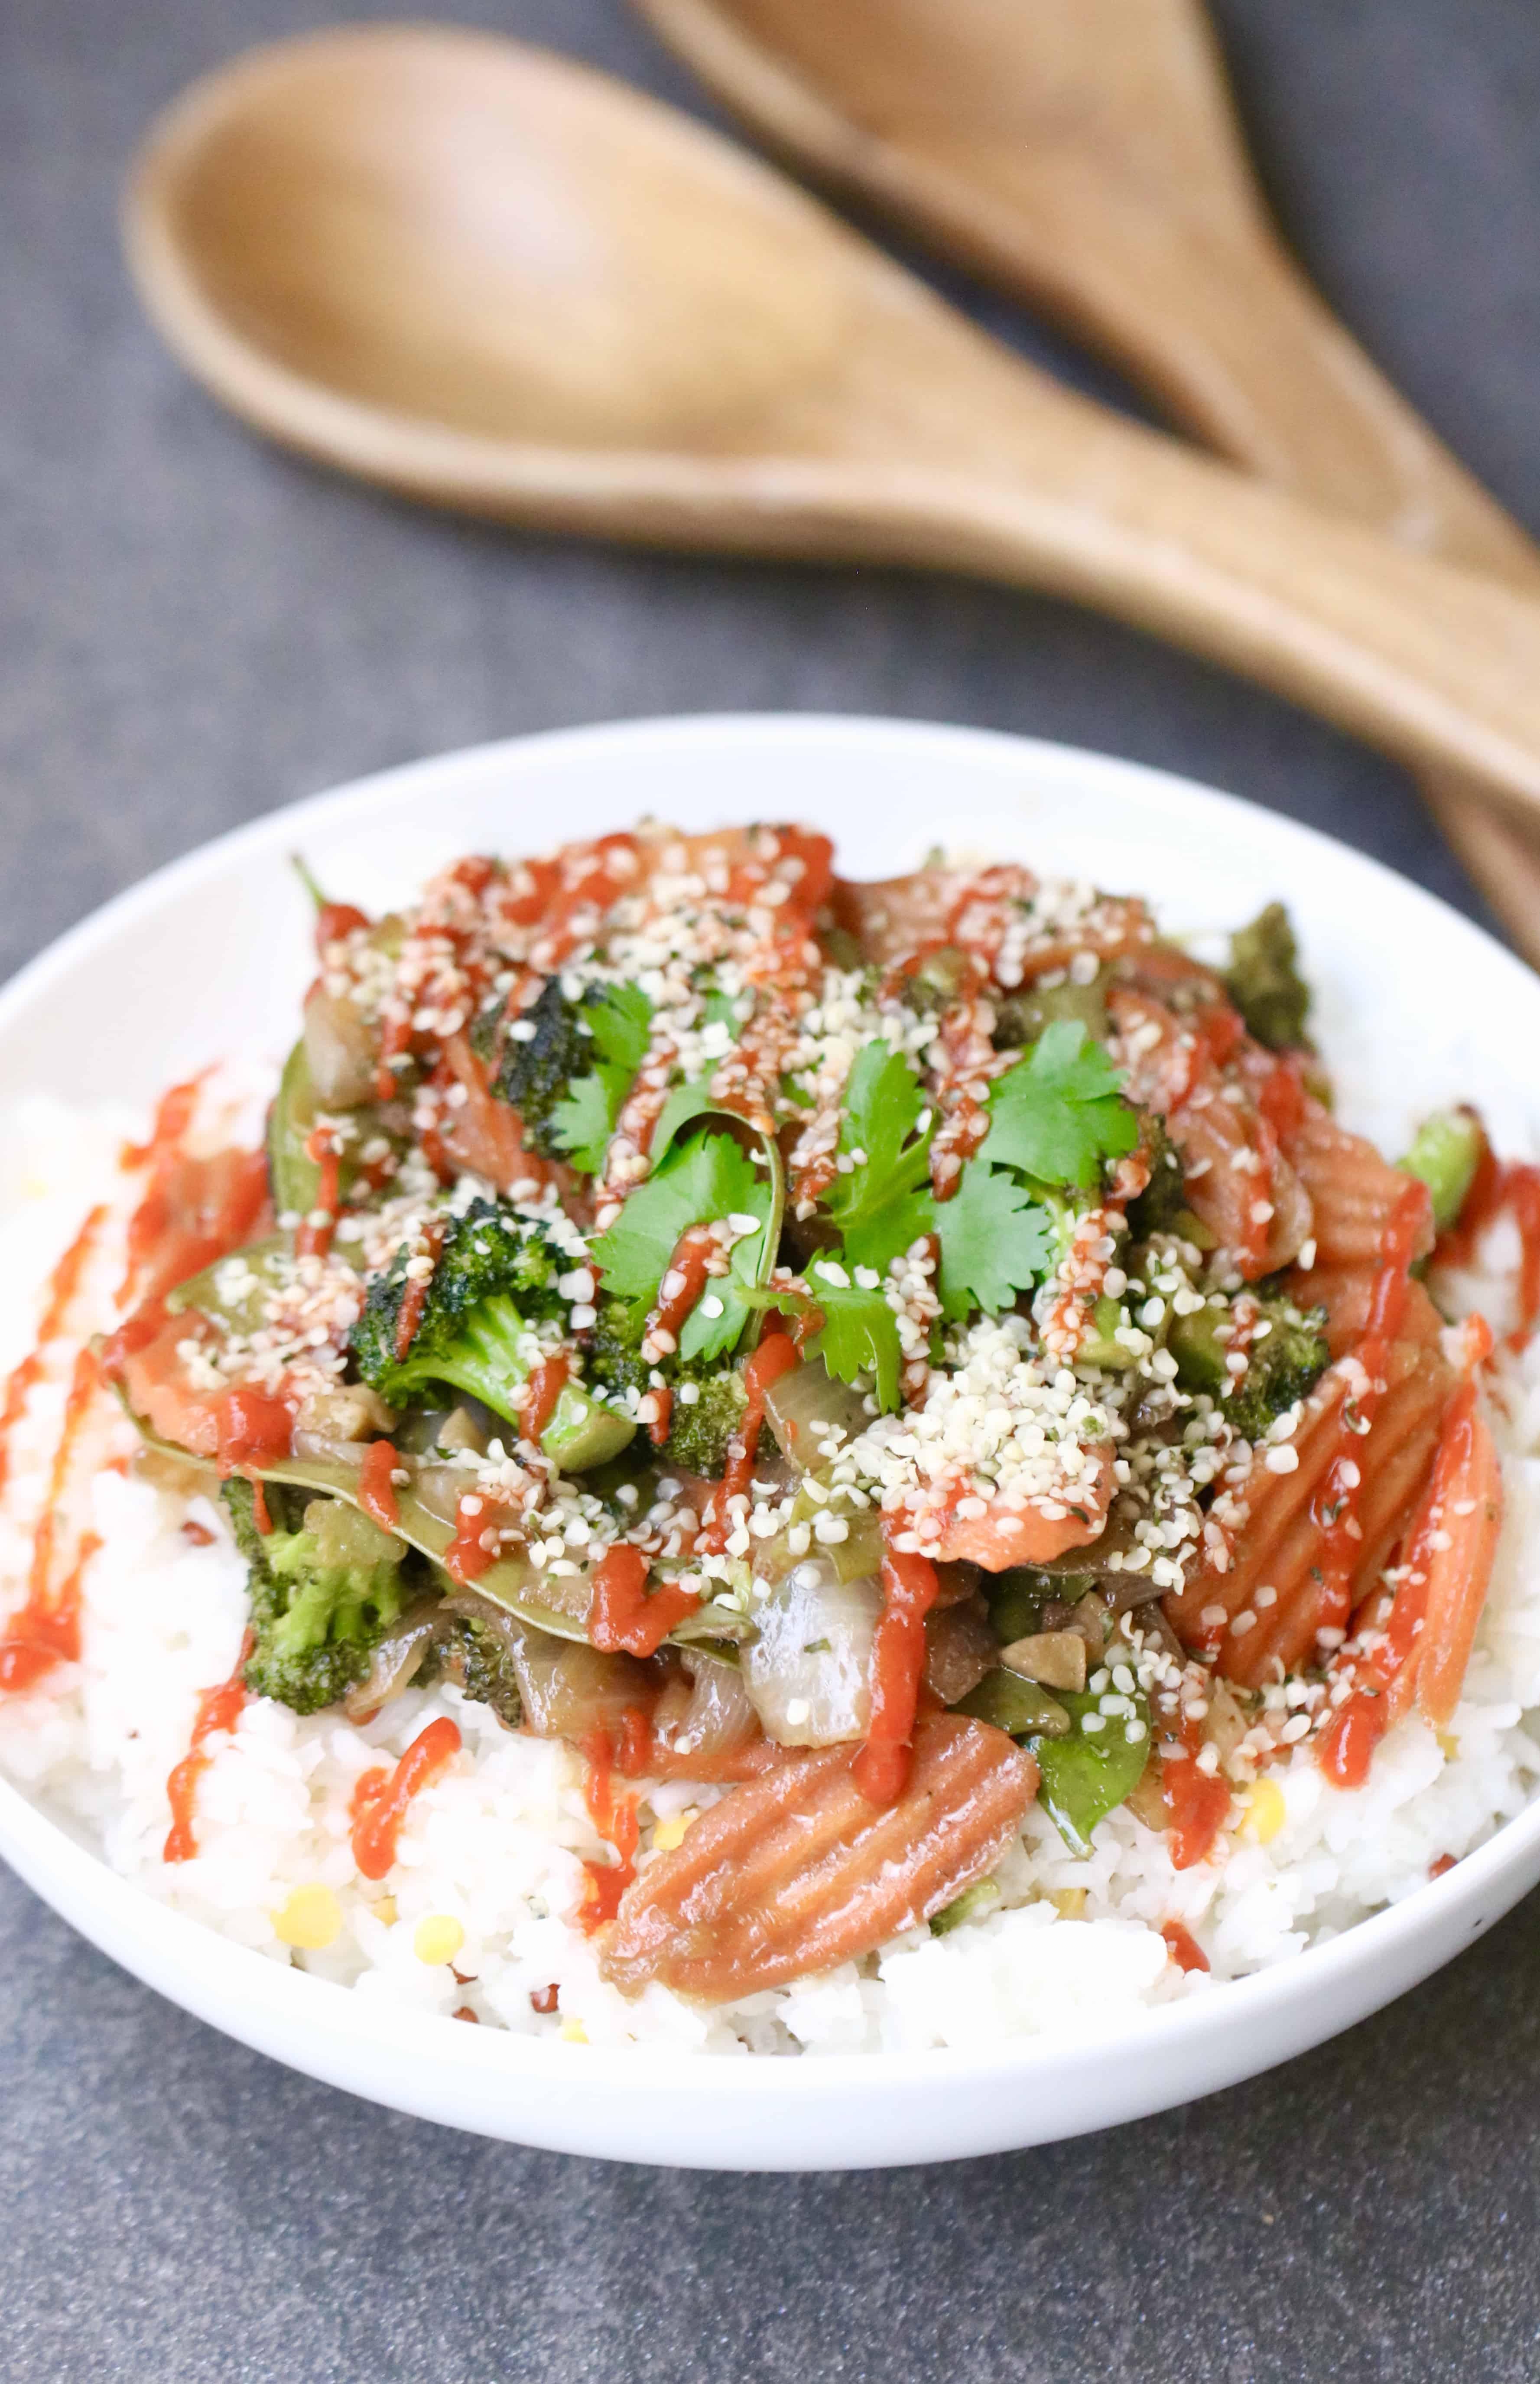 Stir Fry Vegetables with Basmati Rice + Easy Ways to Reduce Food Waste @shawsimpleswaps